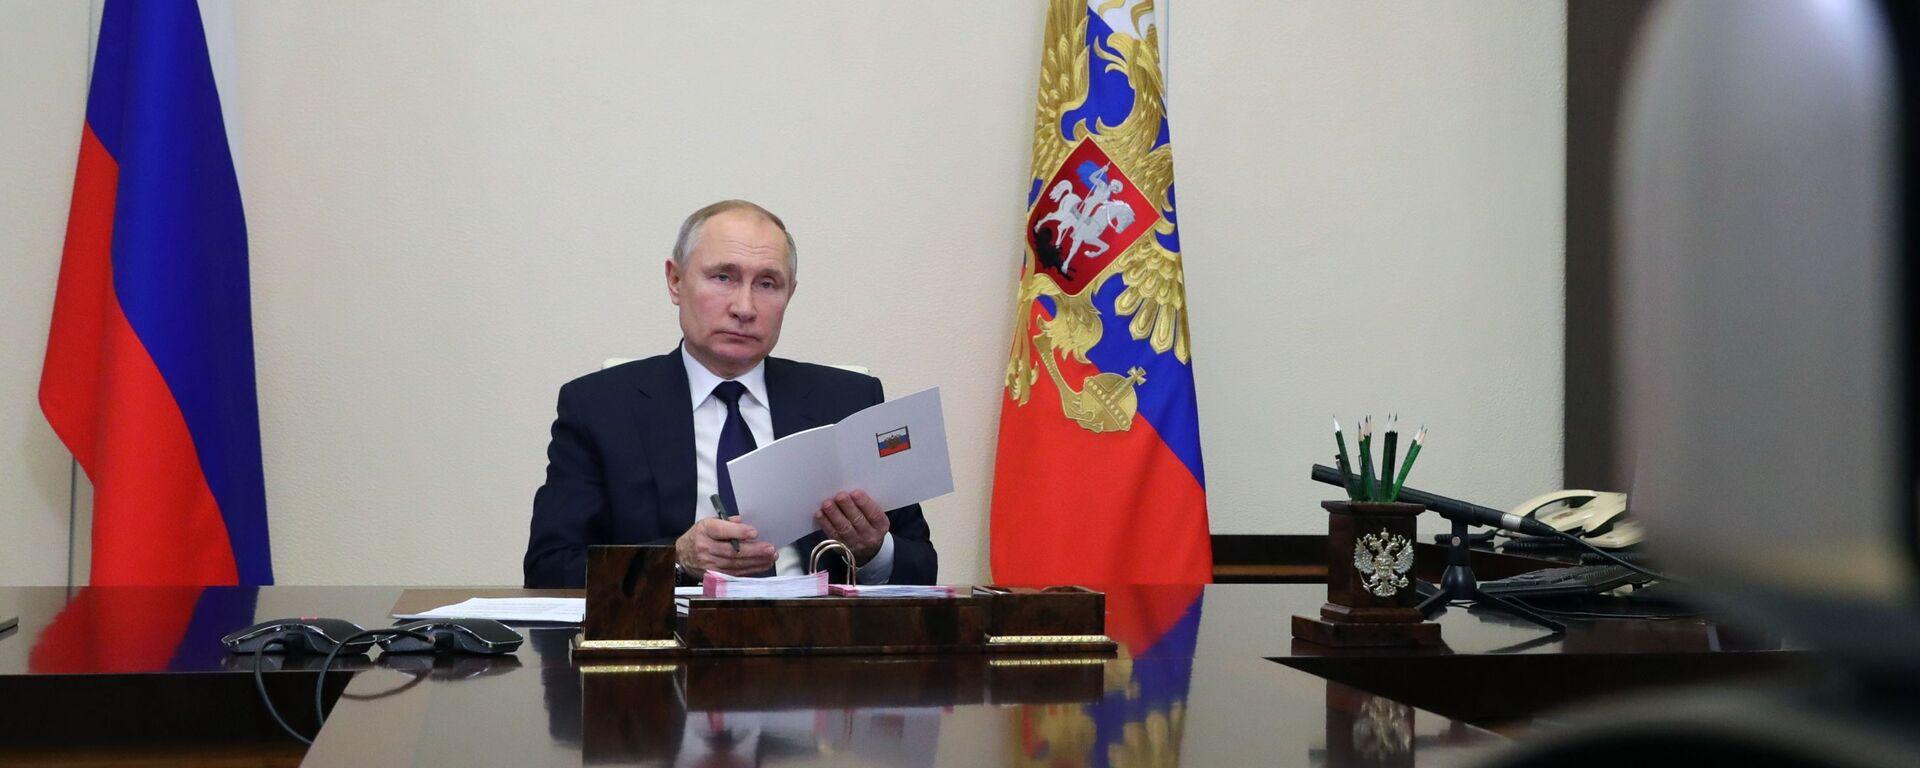 Predsednik Rusije Vladimir Putin - Sputnik Srbija, 1920, 17.02.2021